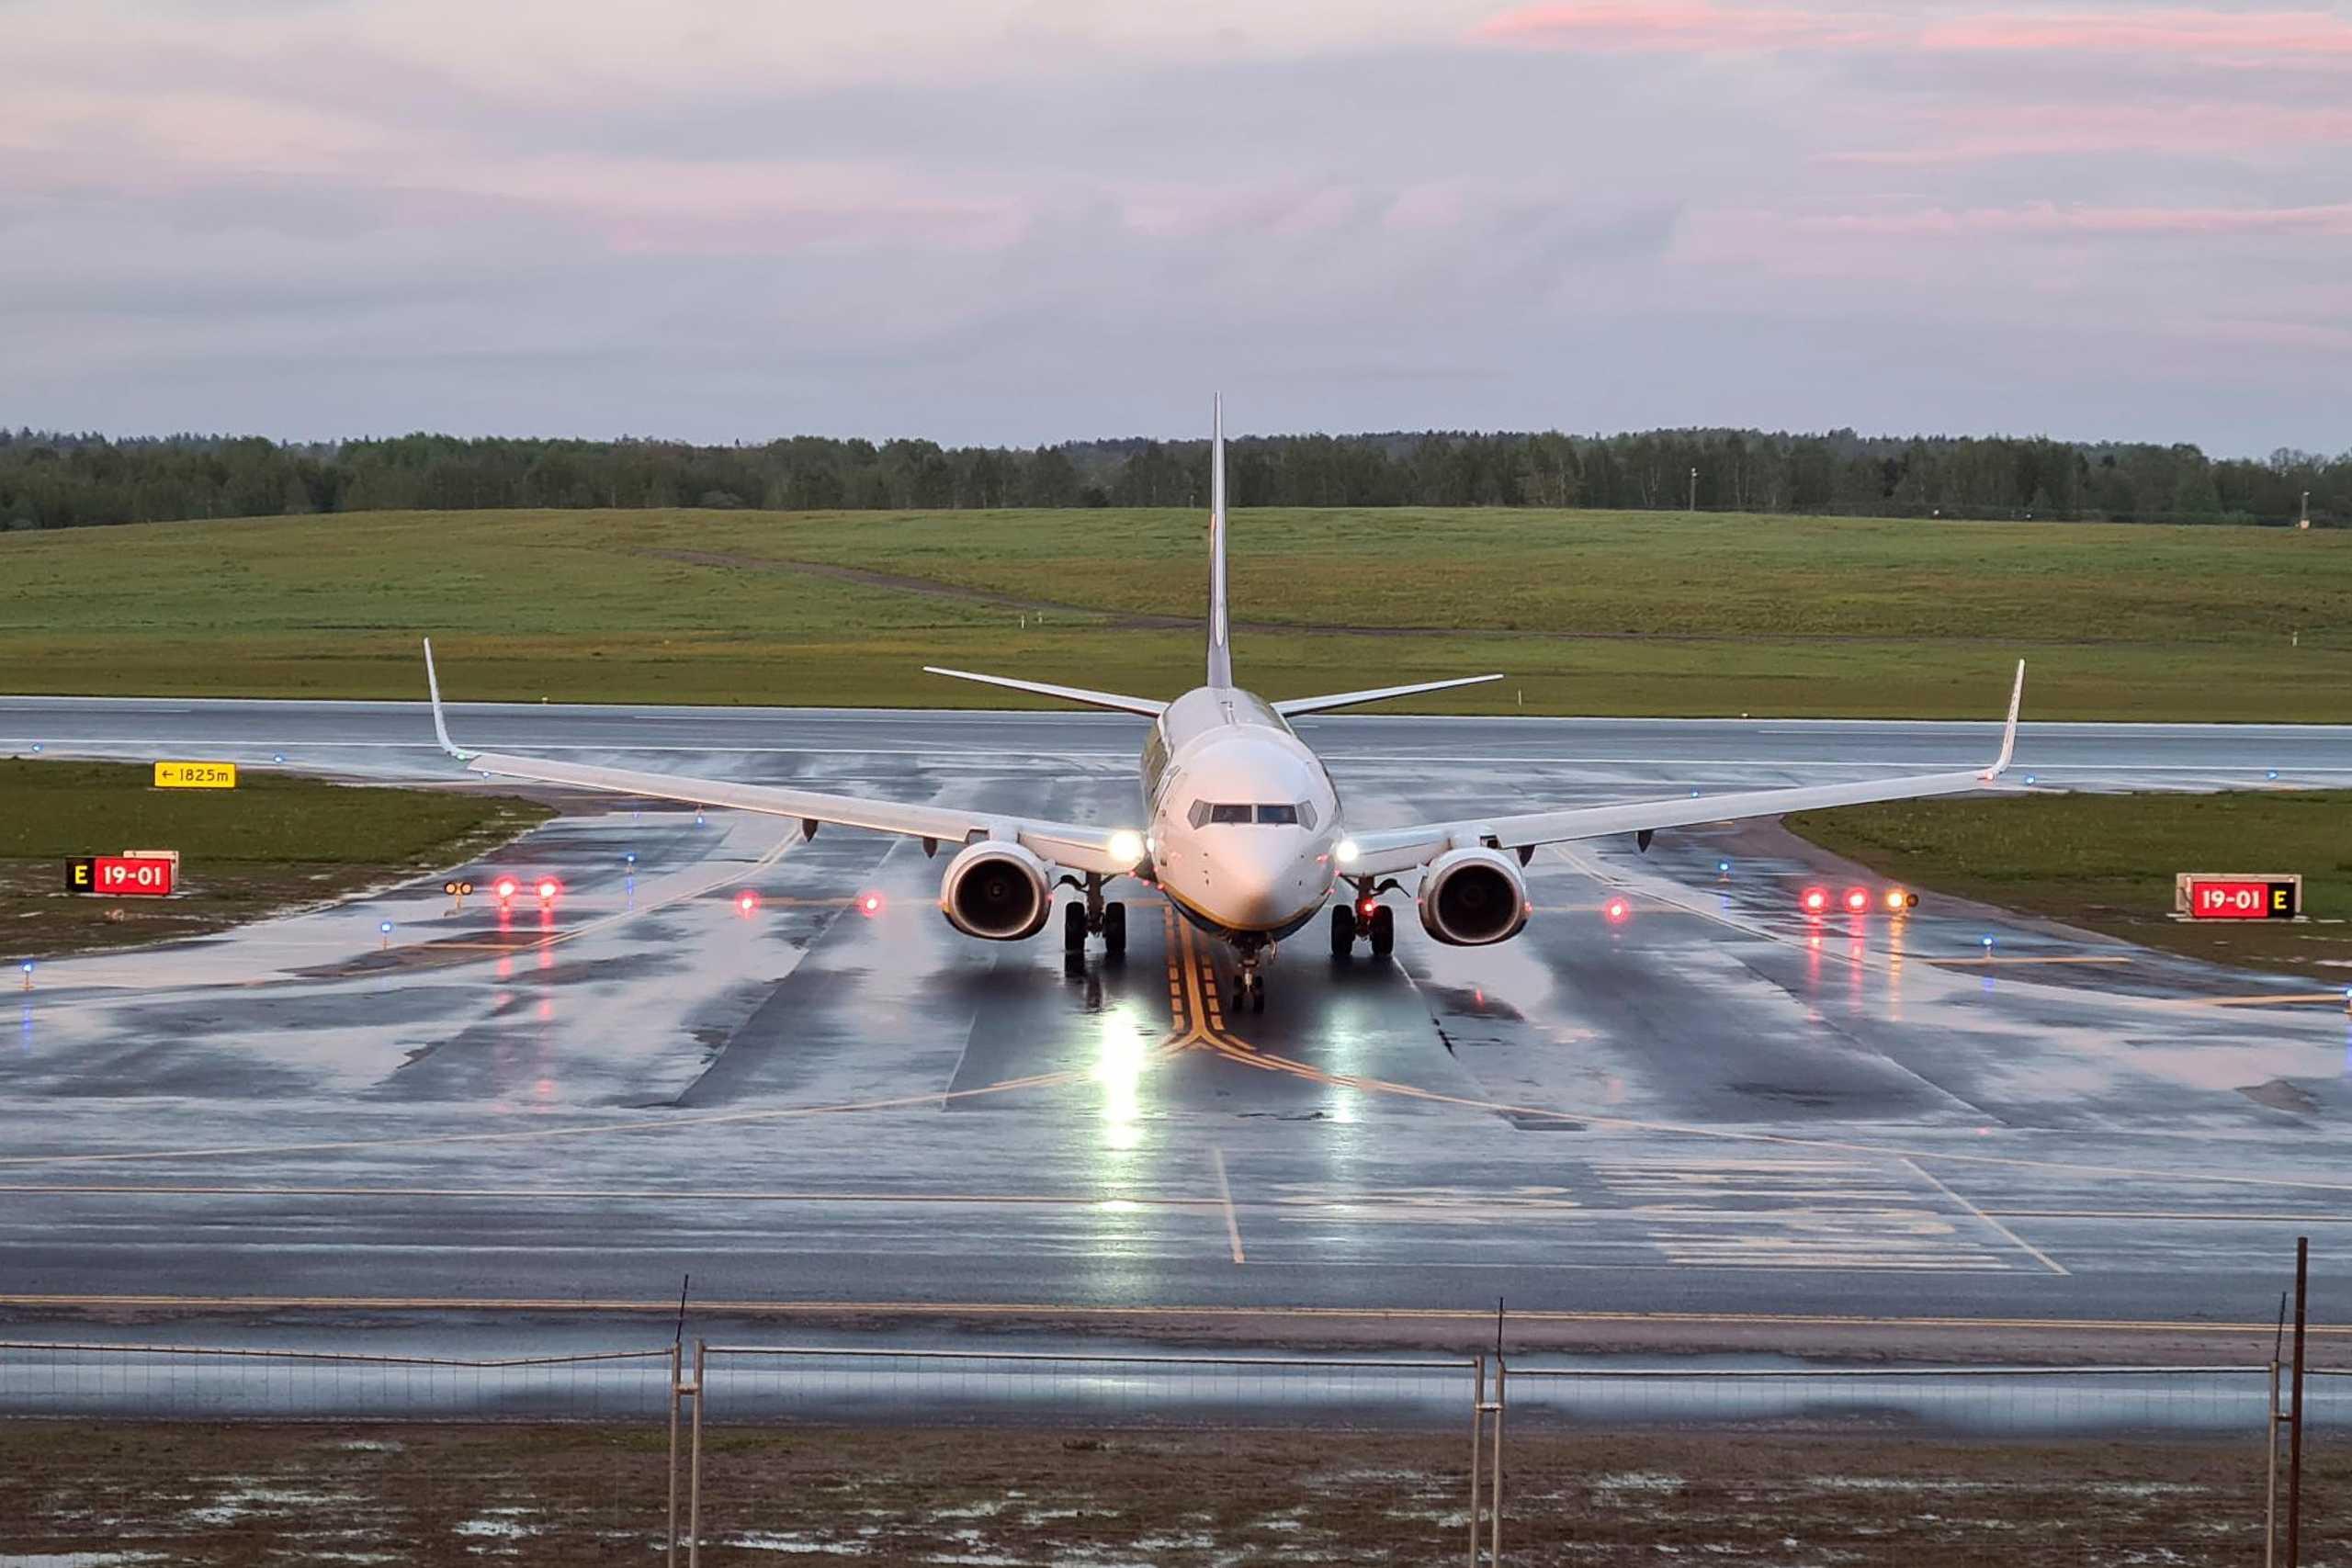 H Πολωνία θέλει να έχει πρόσβαση στα μαύρα κουτιά του αεροσκάφους της Ryanair